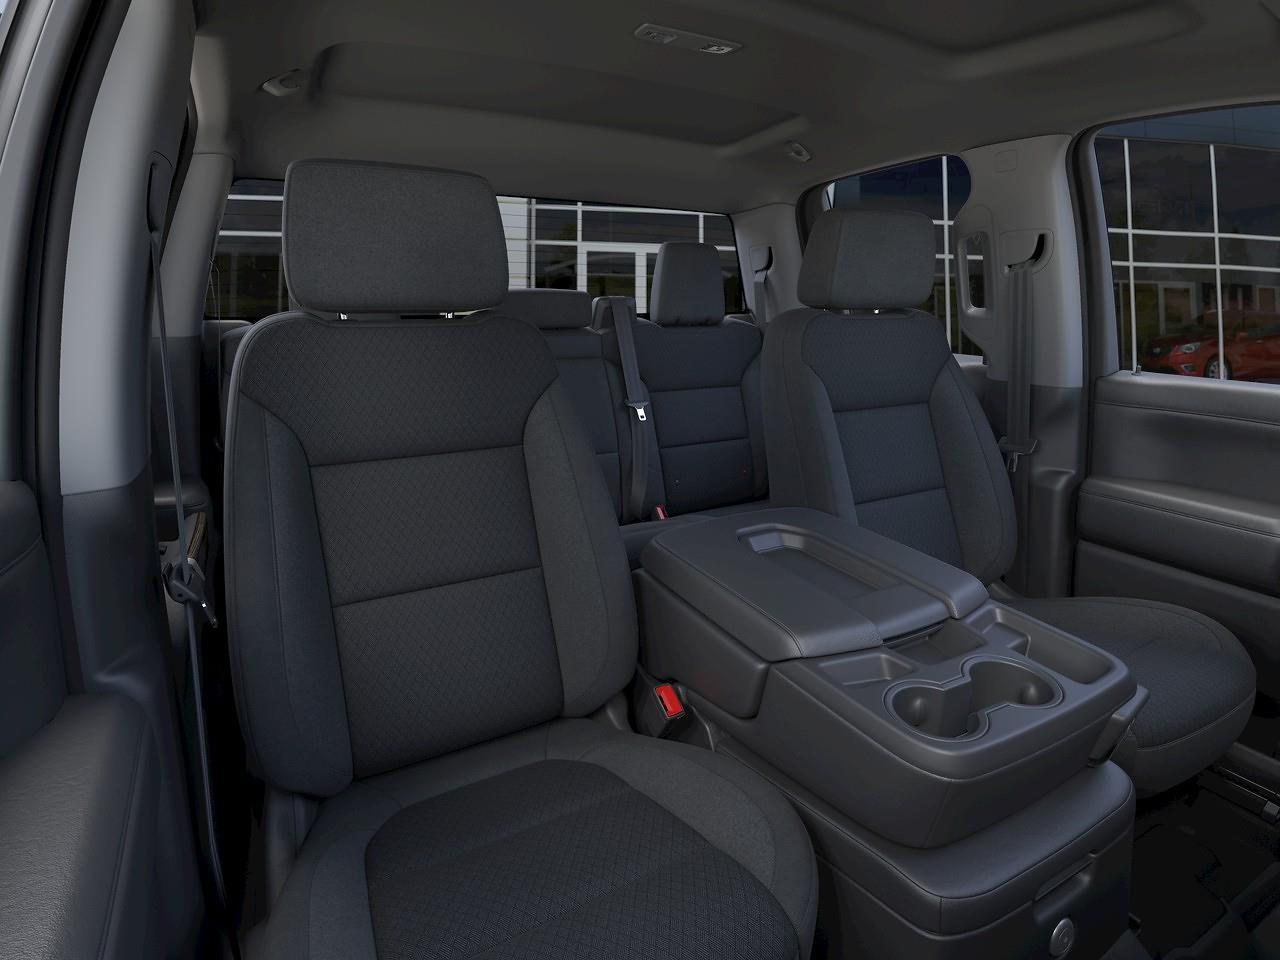 2021 Sierra 1500 Double Cab 4x4,  Pickup #T3510 - photo 13